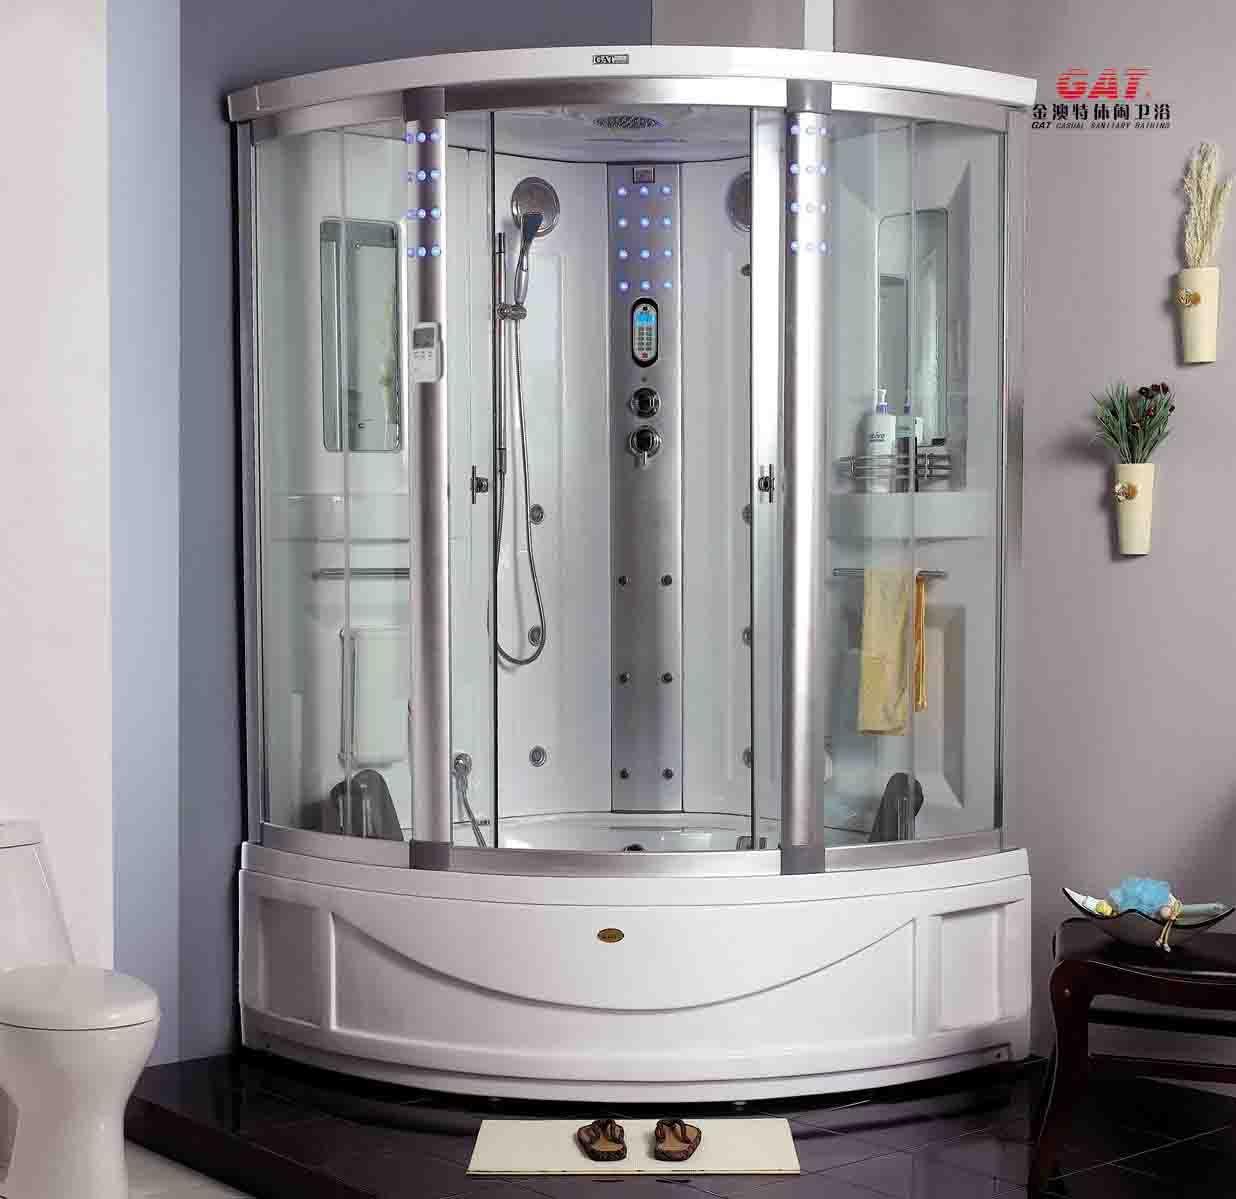 Breathtaking Bathroom Designs Jacuzzi Tub Gallery - Simple Design ...